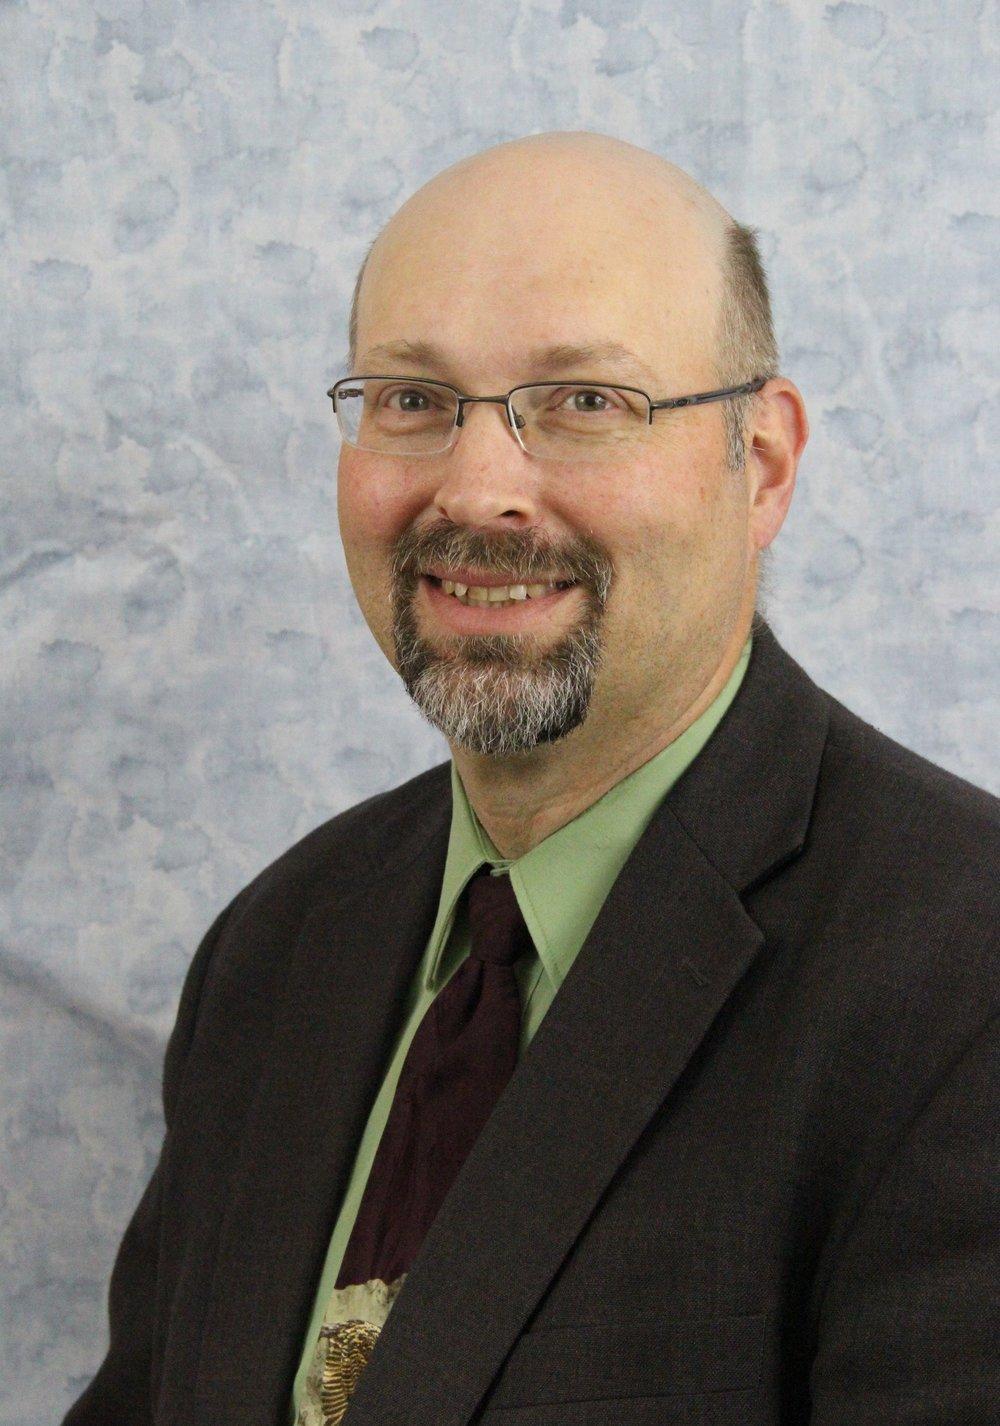 Kenneth Fleeman Manager of Engineering